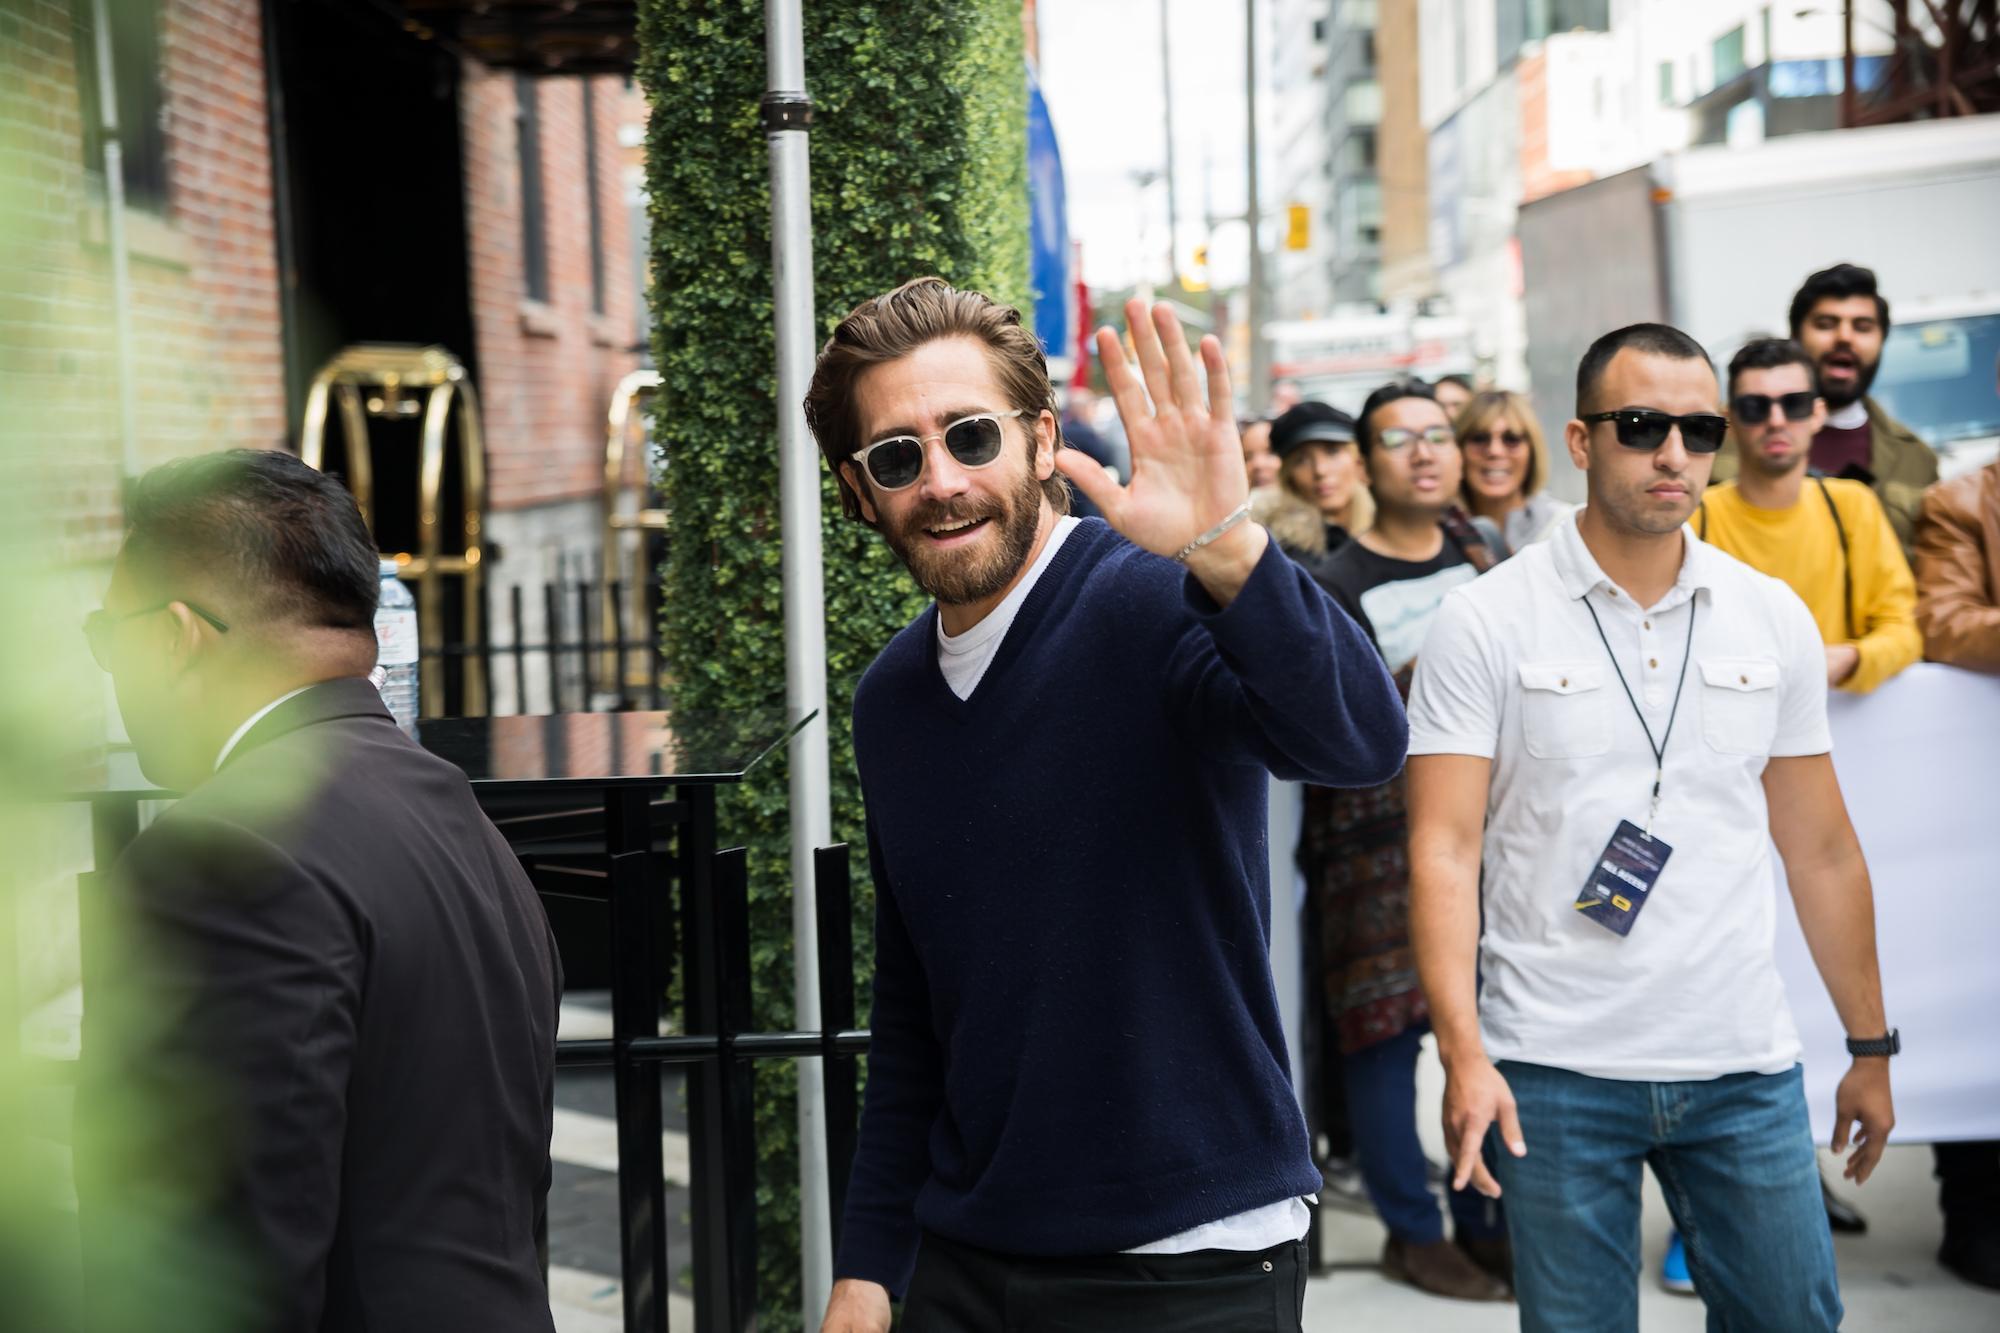 TIFF 2017 celebrity Jake Gyllenhal